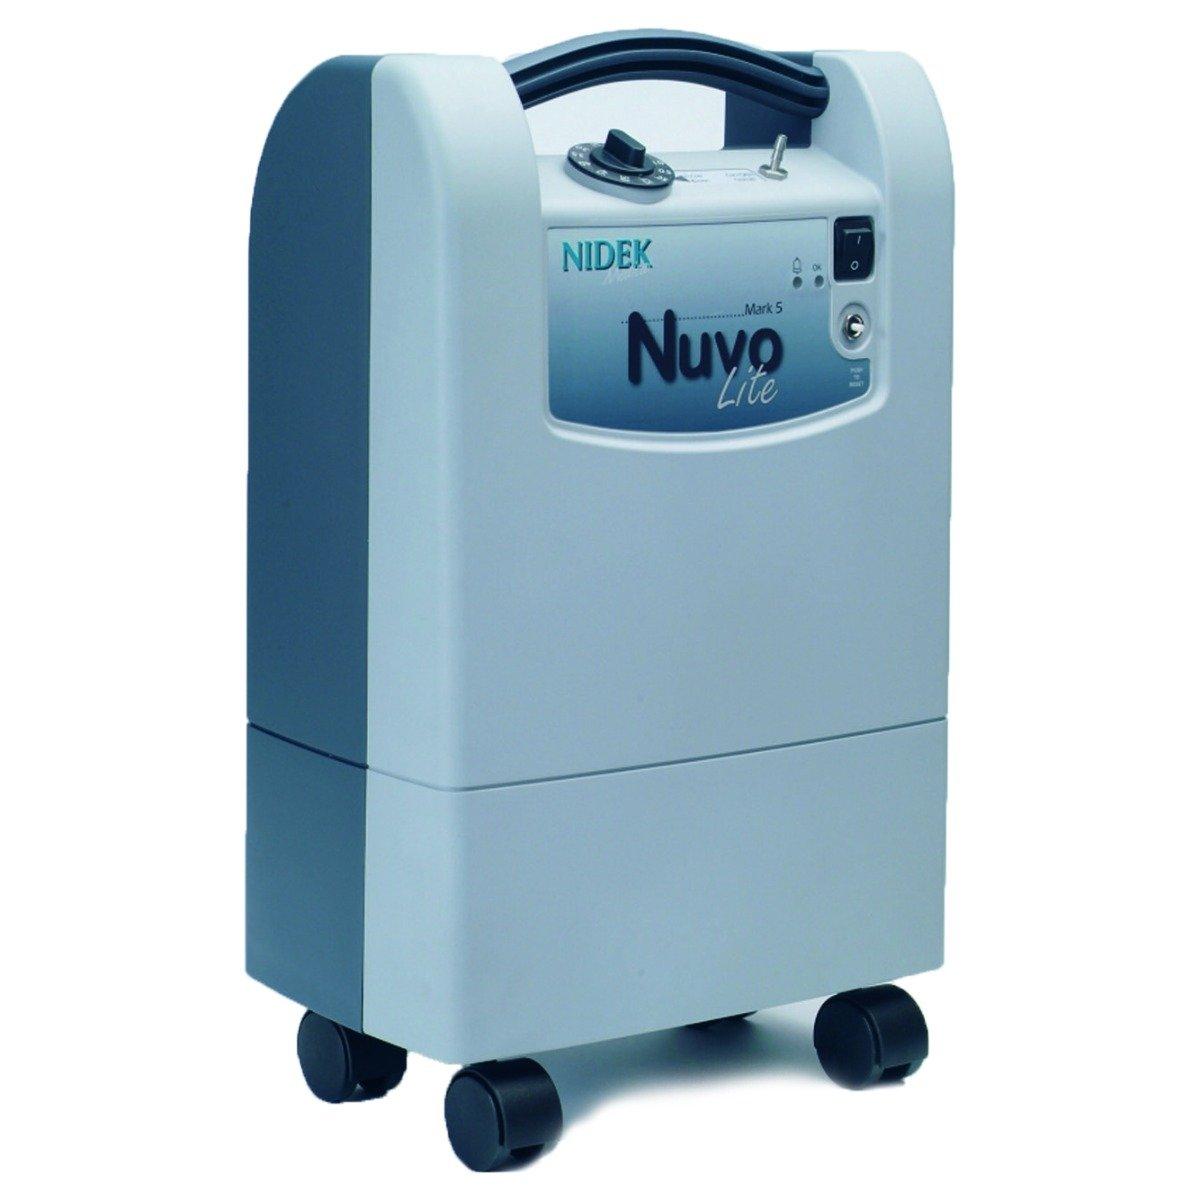 NIDEK Nuvo Lite 3 - 3LPM Domestic Oxygen Concentrator